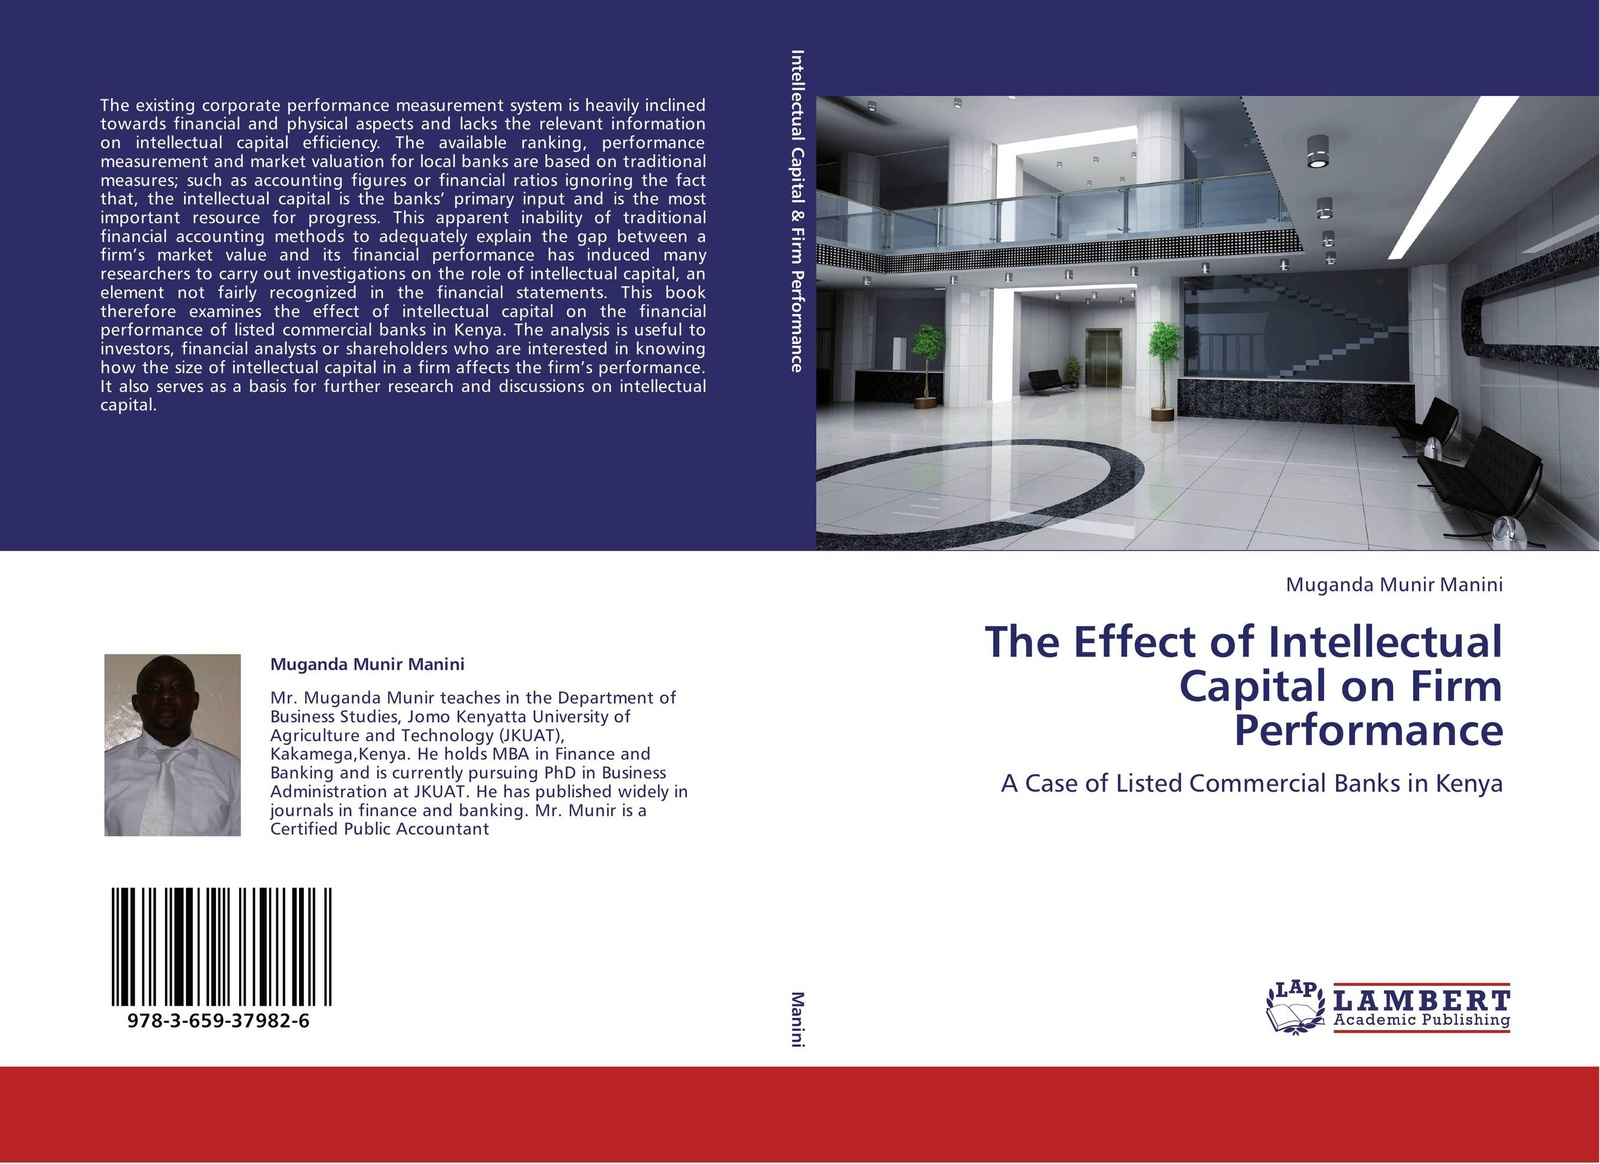 Muganda Munir Manini The Effect of Intellectual Capital on Firm Performance цена в Москве и Питере